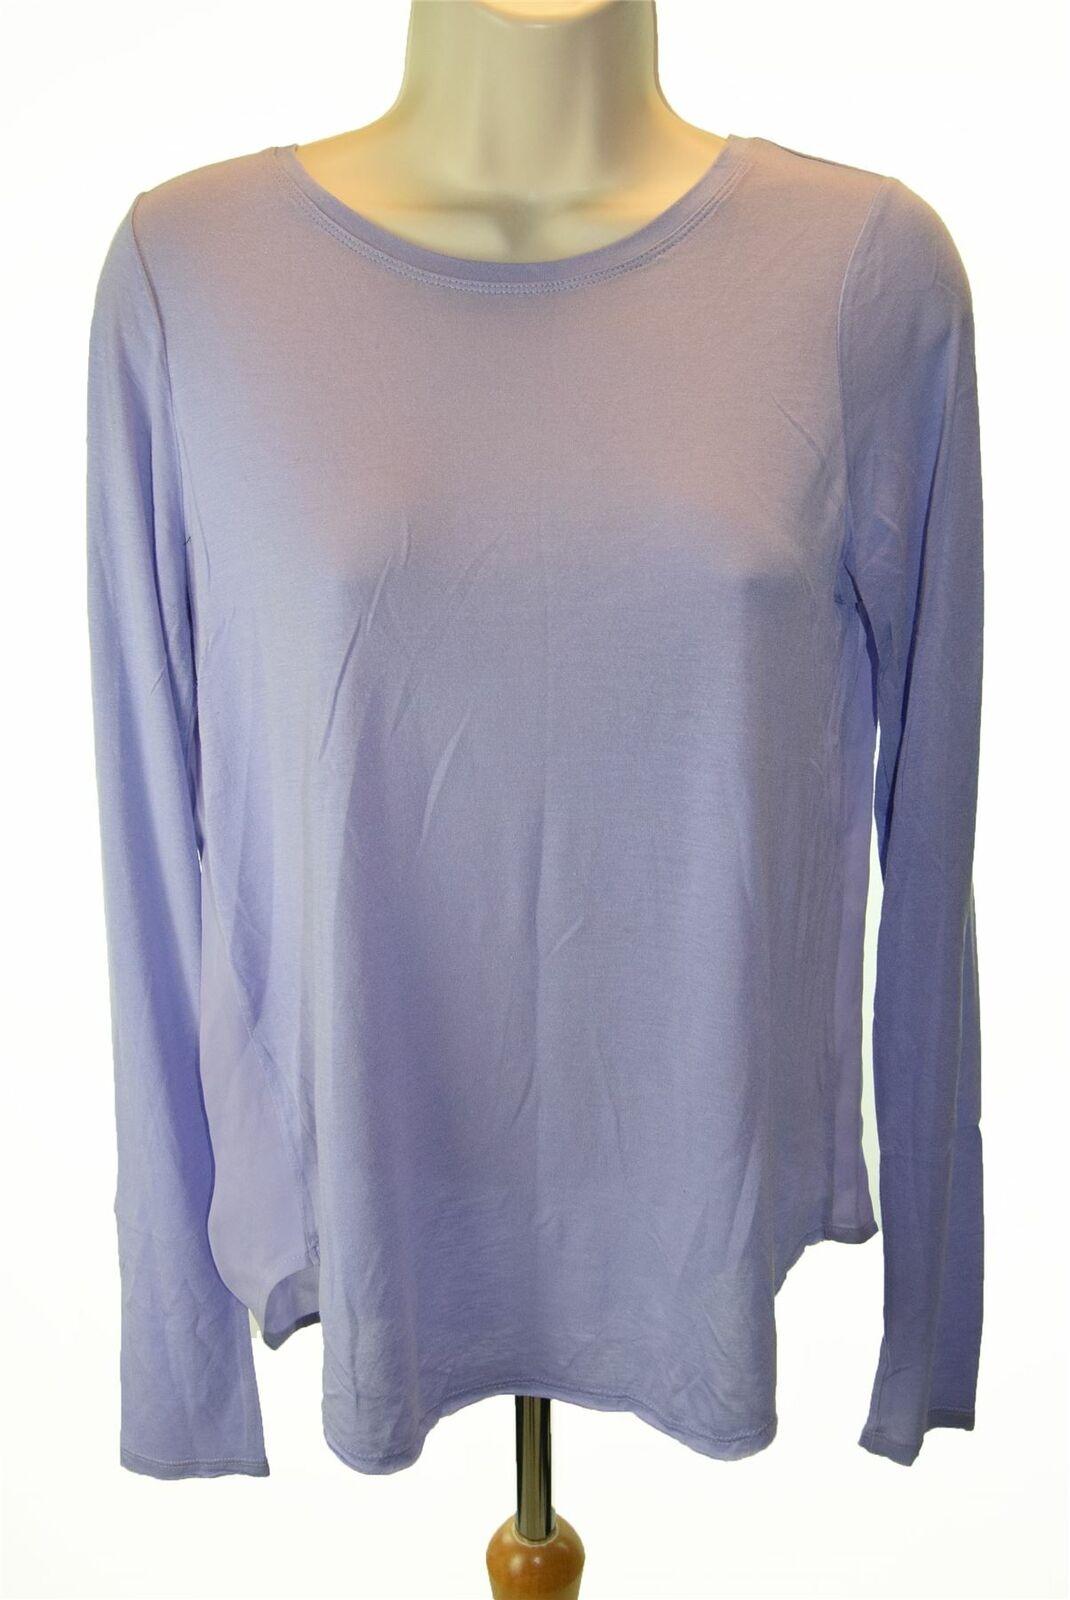 VINCE Purple Long Sleeve Top, Size XS